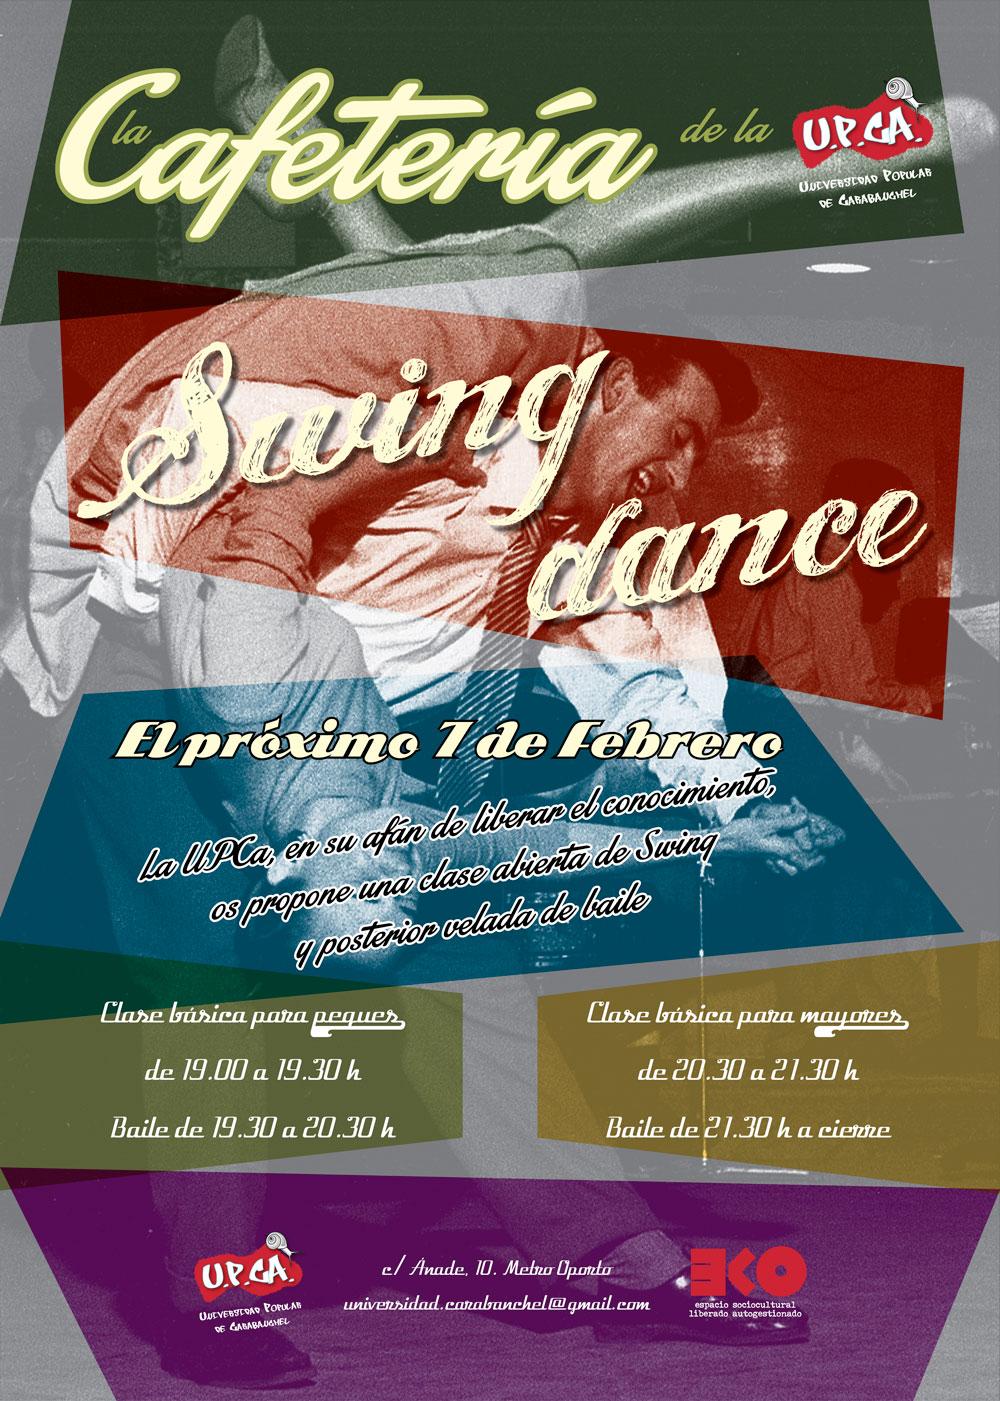 Cafeta-feb'14-swing